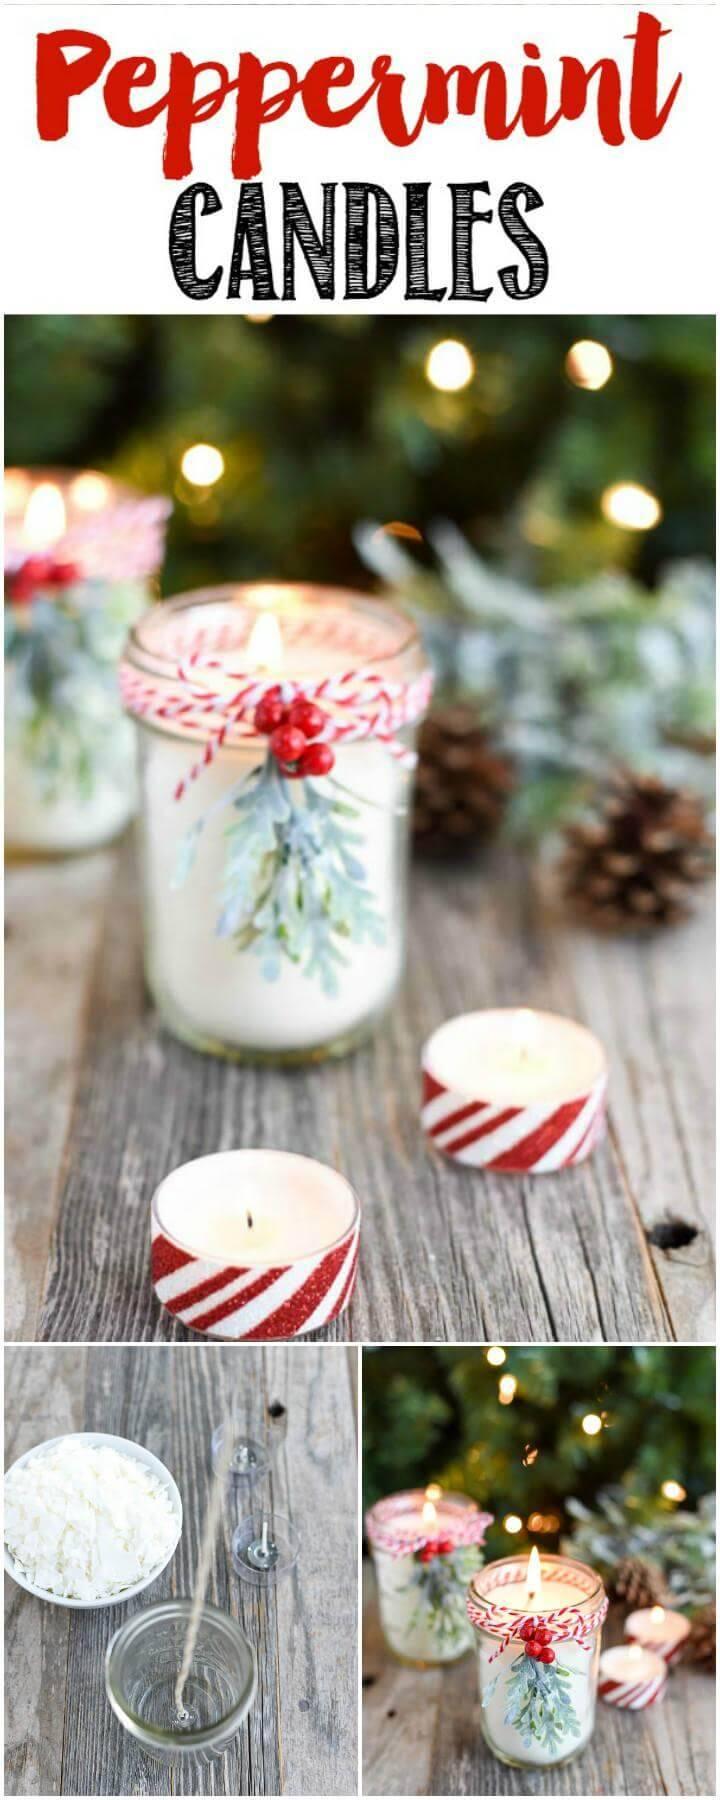 DIY Homemade Peppermint Mason Jar Candles